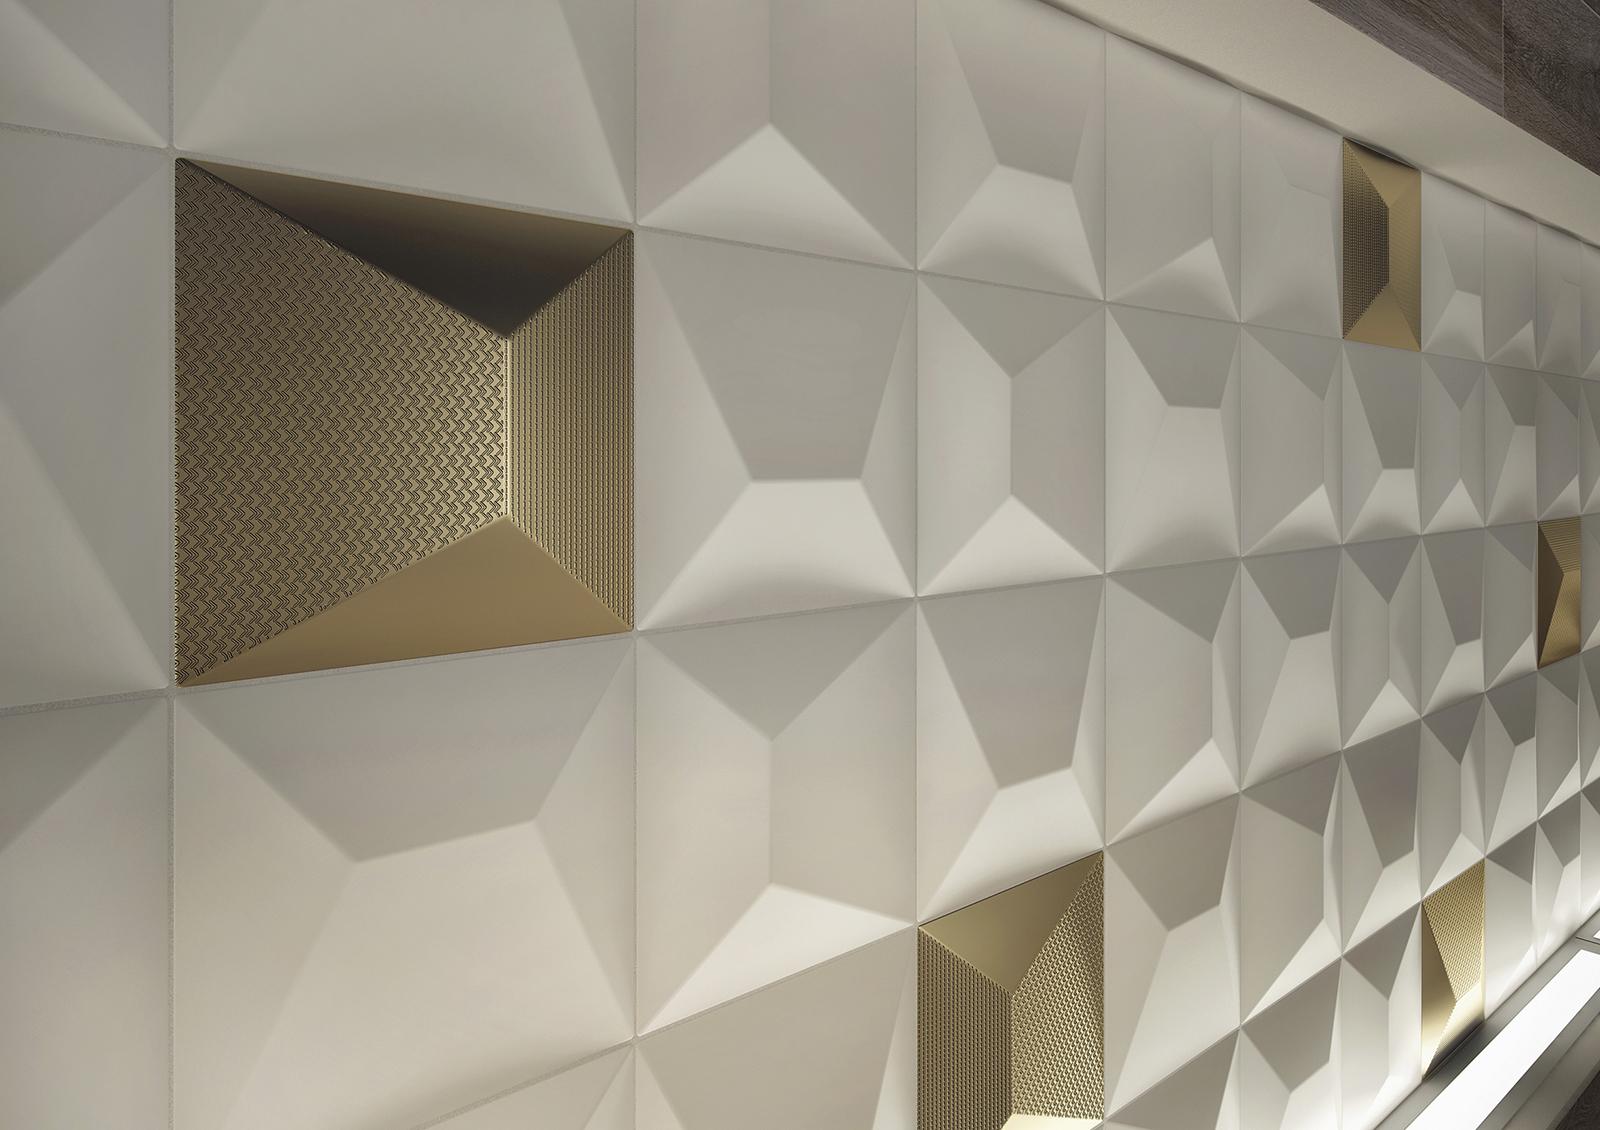 Dune Multishapes Shapes Płytki 3d Nowość W Ofercie